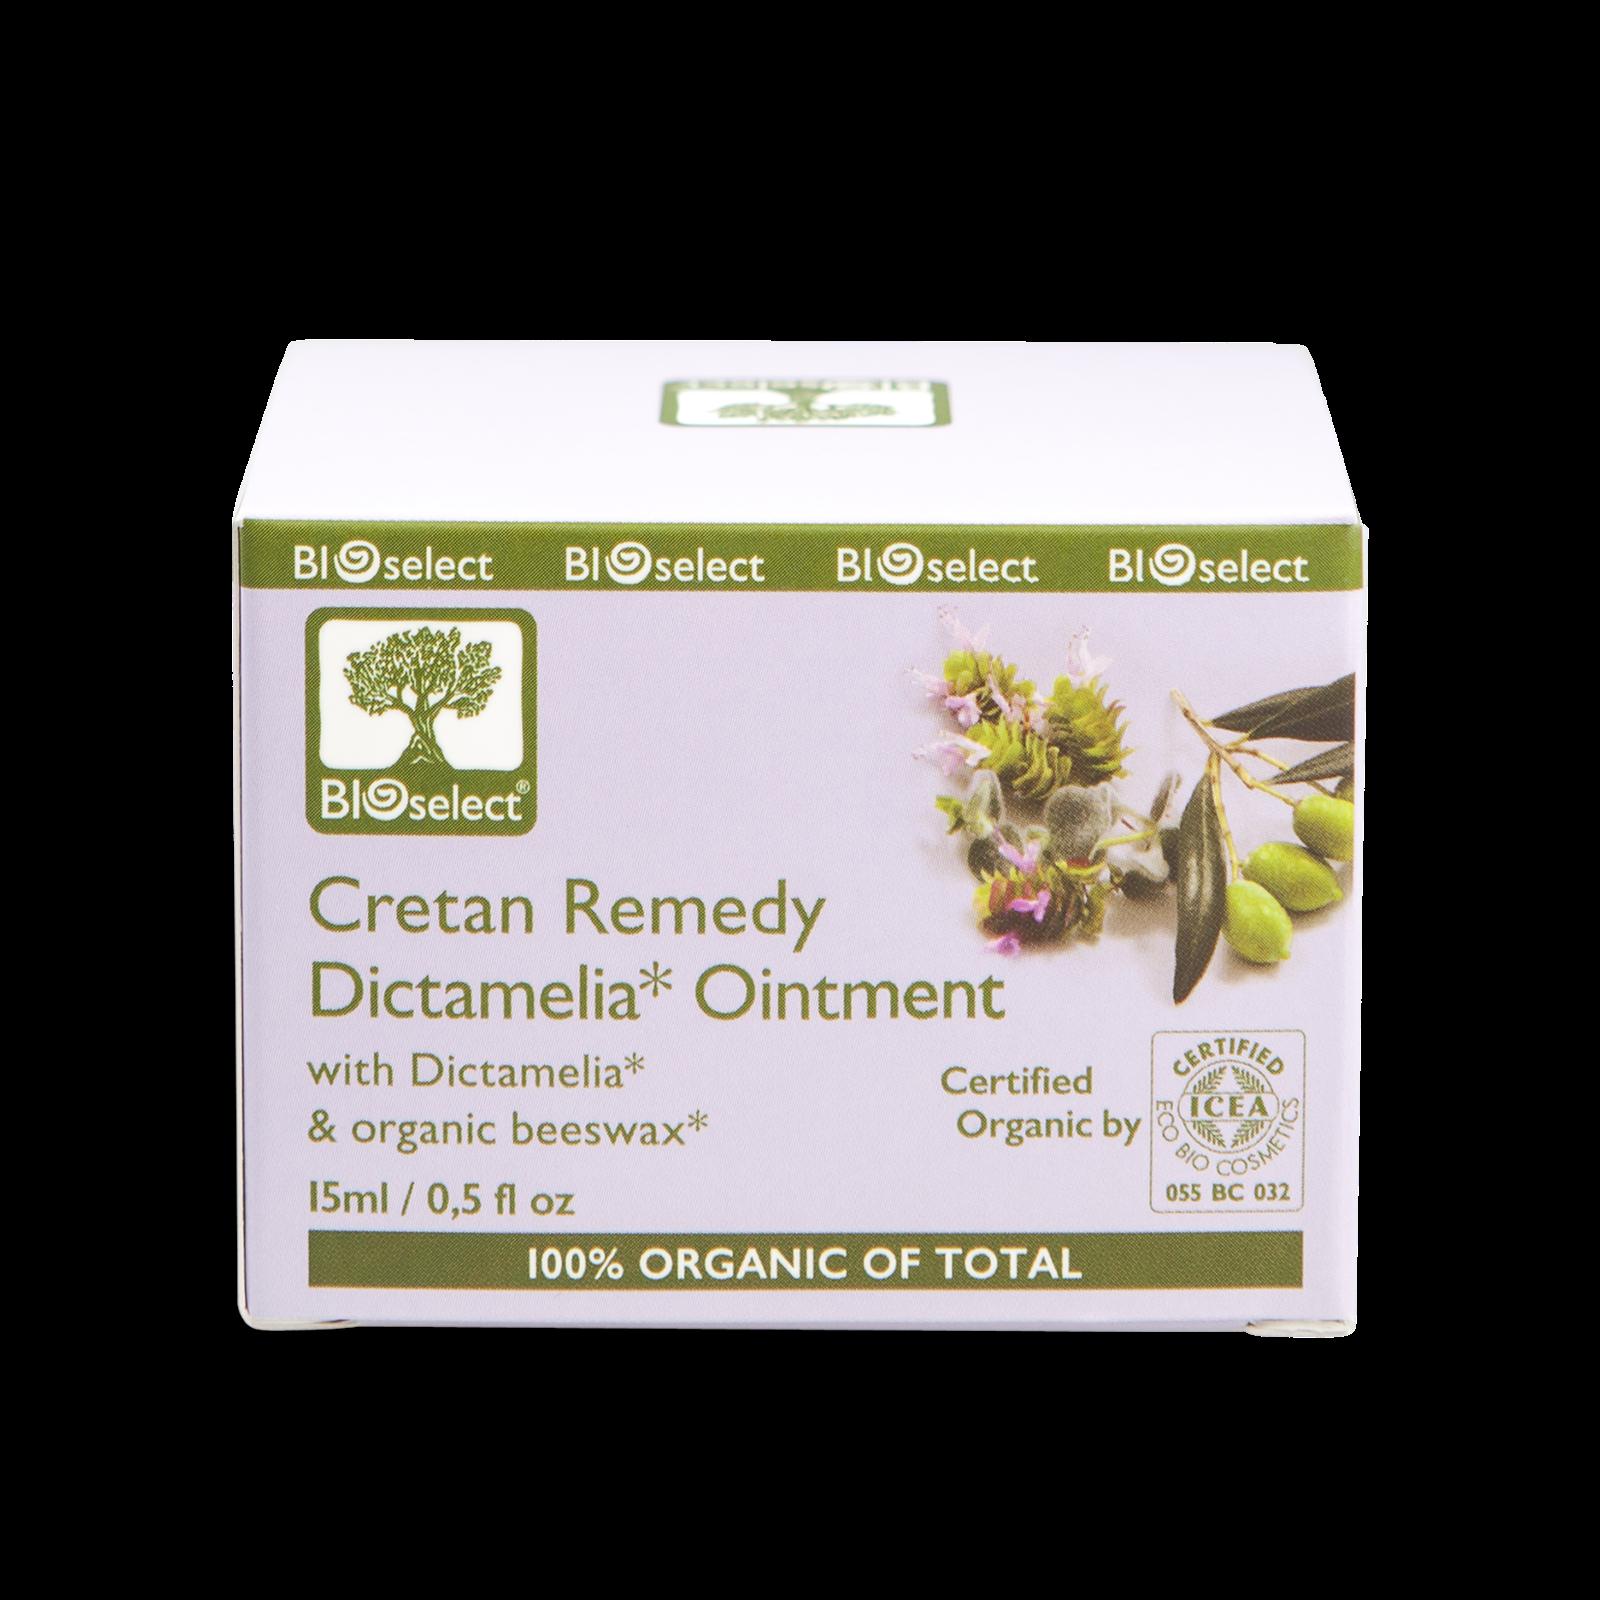 Bioselect Cretan remedy Dictamelia® Ointment